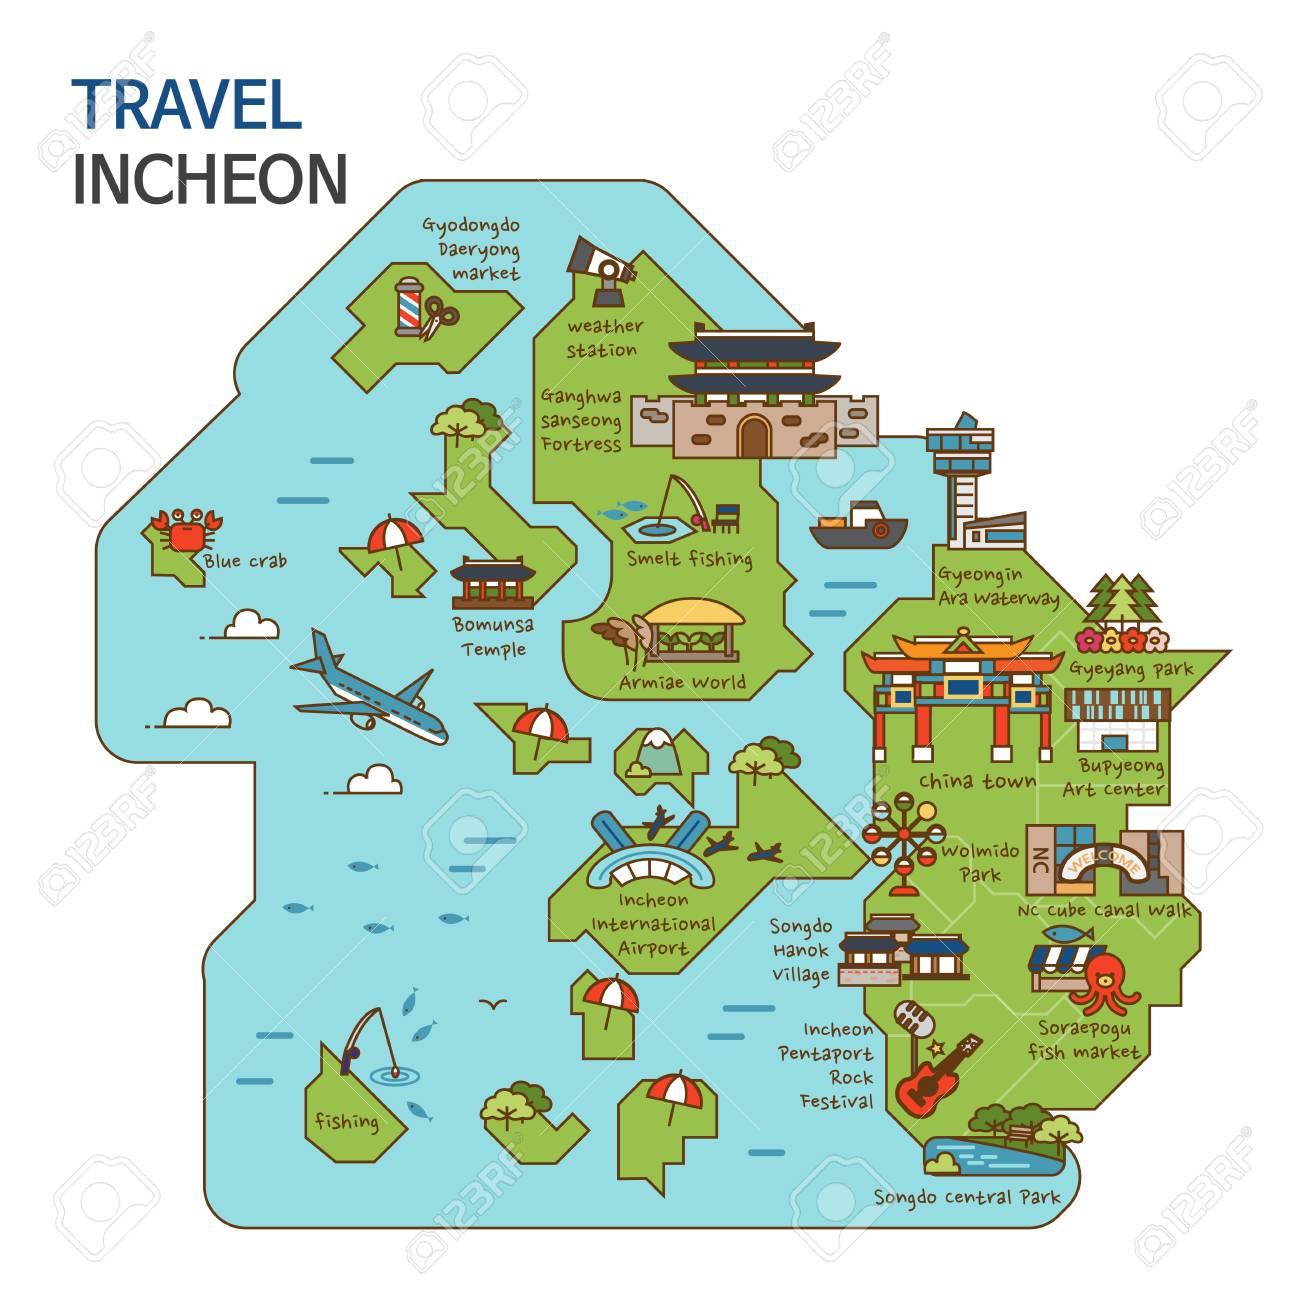 Ulsan Korea Map.City Tour Travel Map Illustration Incheon City South Korea